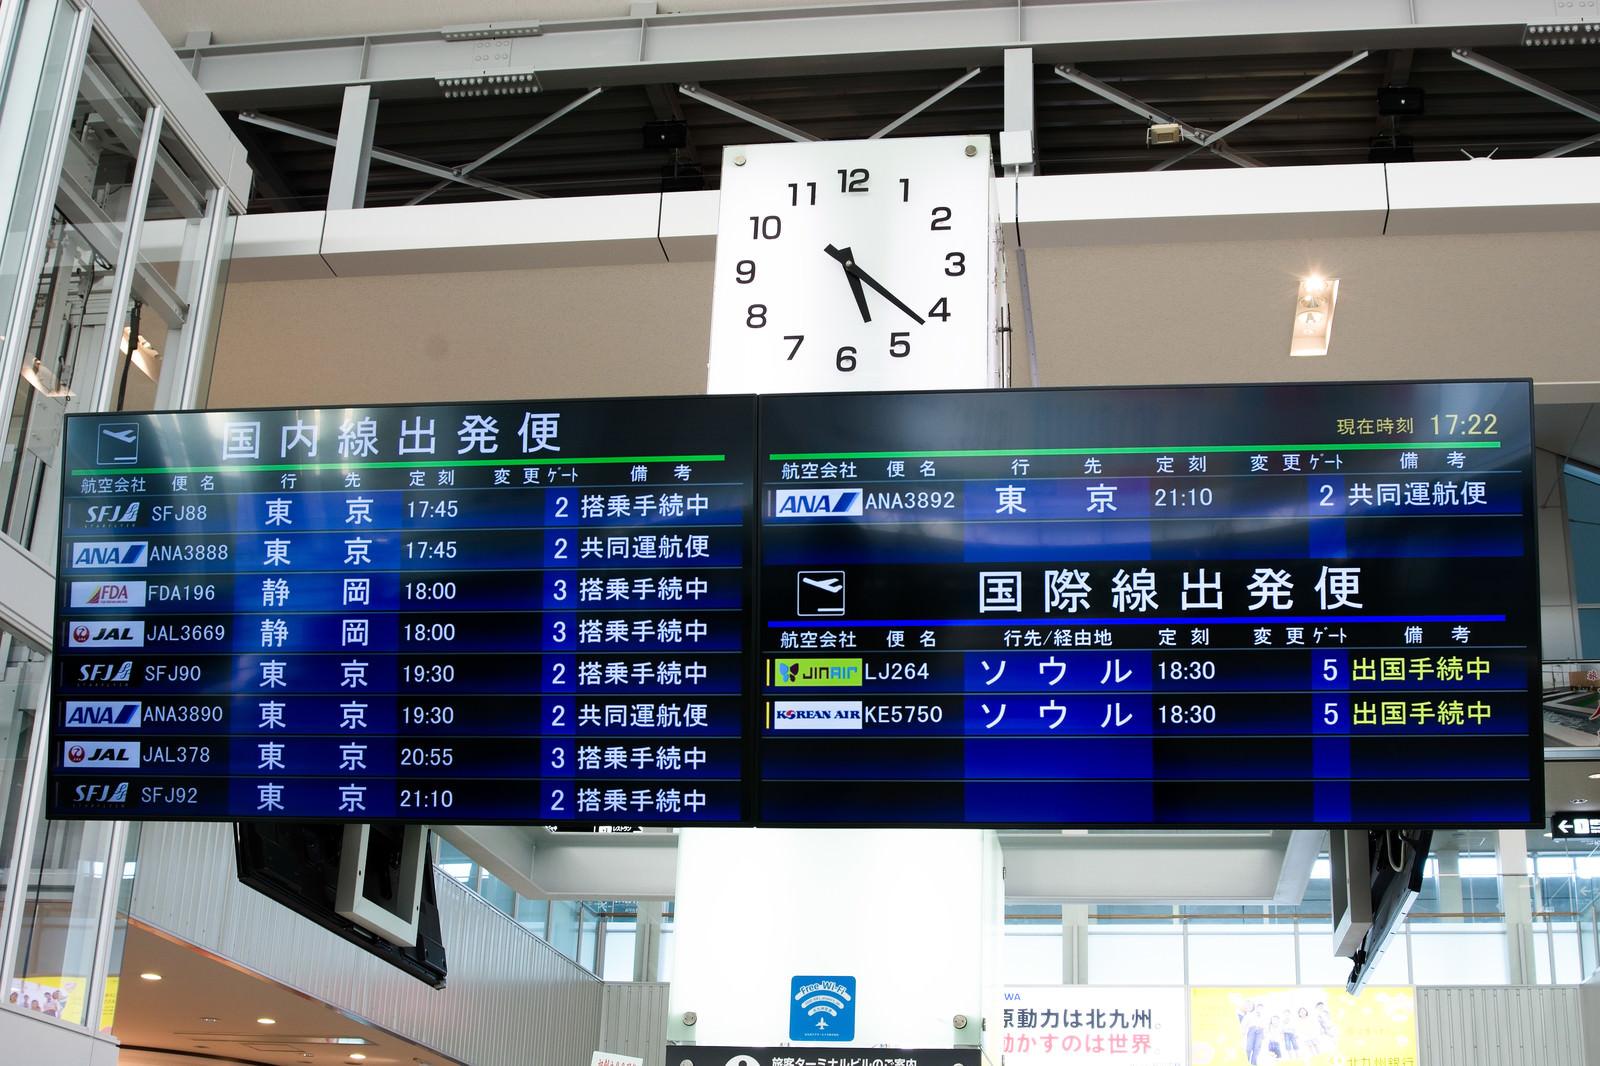 「地方空港の出発便の案内電光掲示板(北九州空港)」の写真